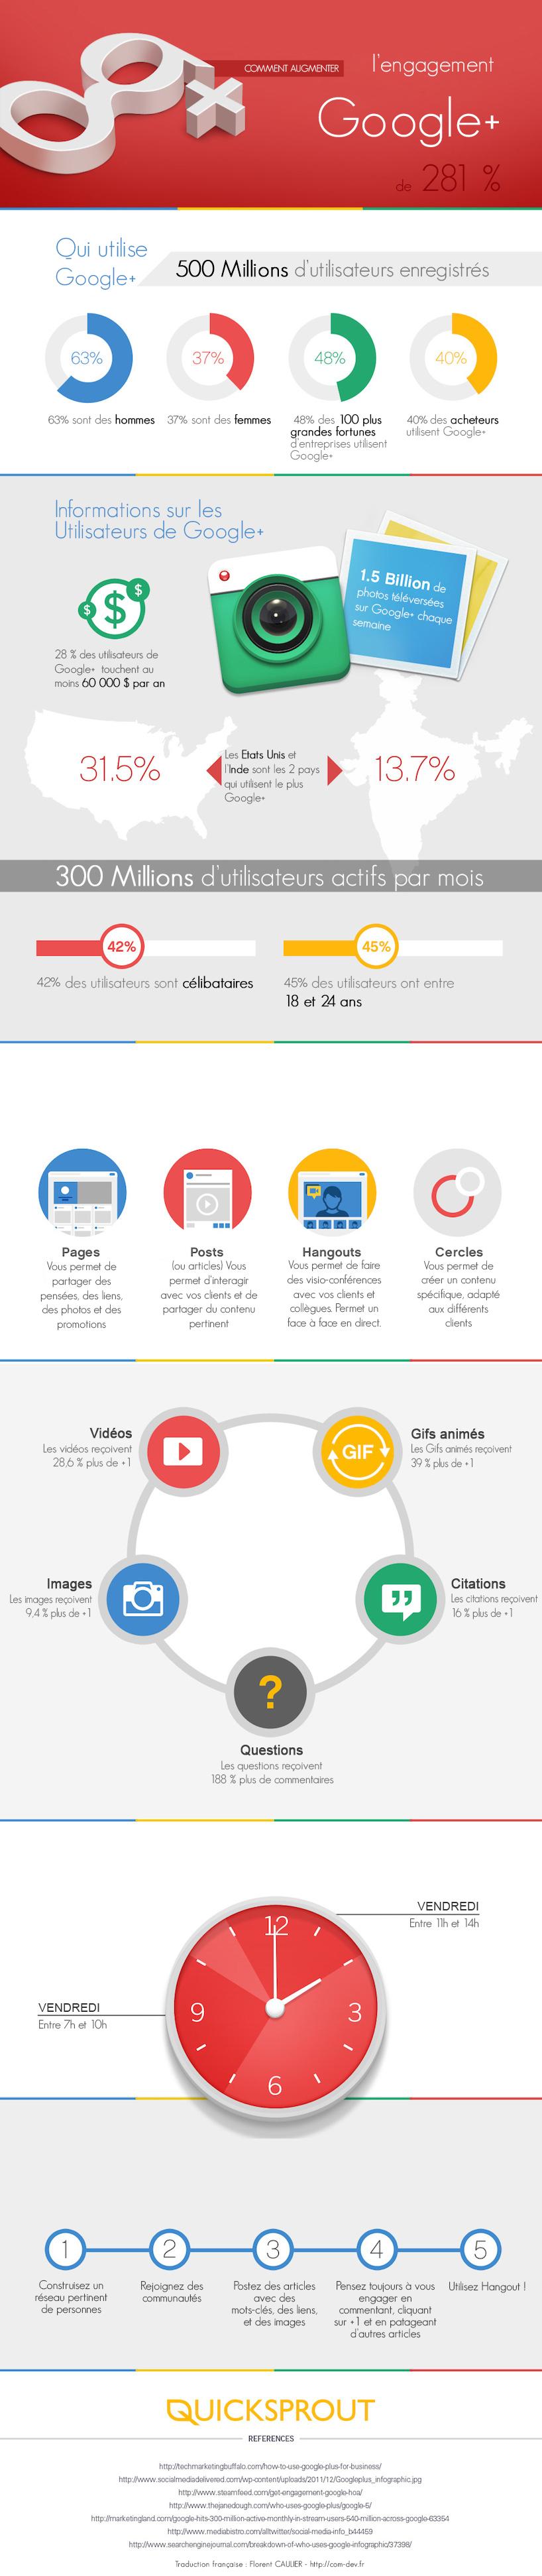 Google+Engagements